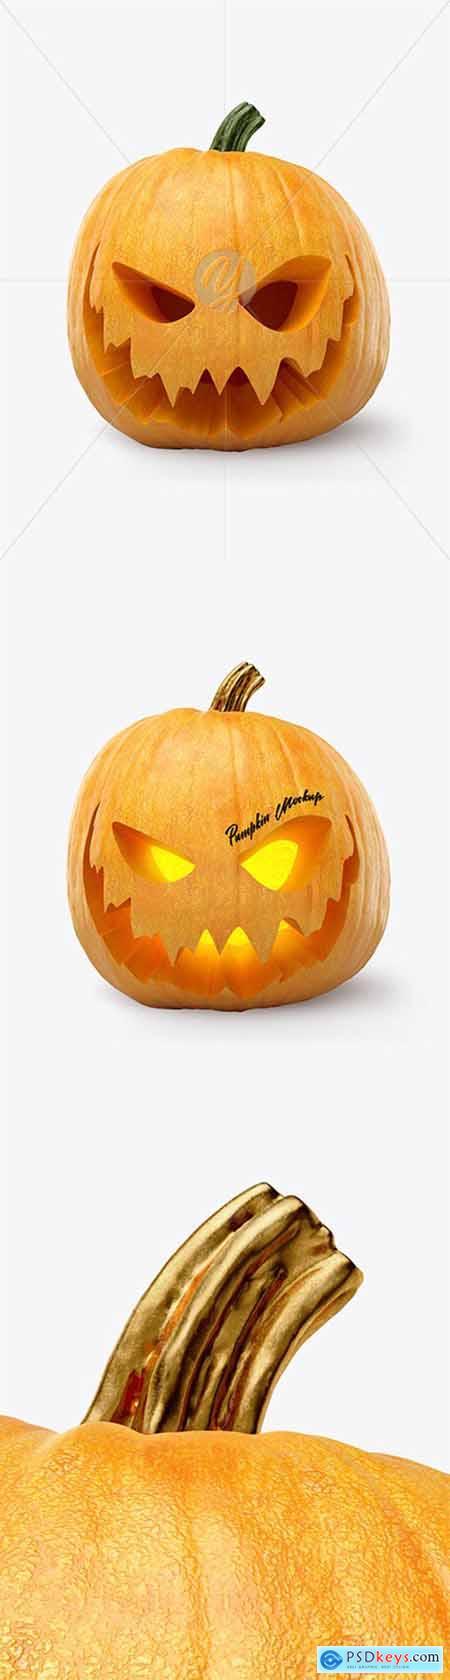 Pumpkin Mockup 50729